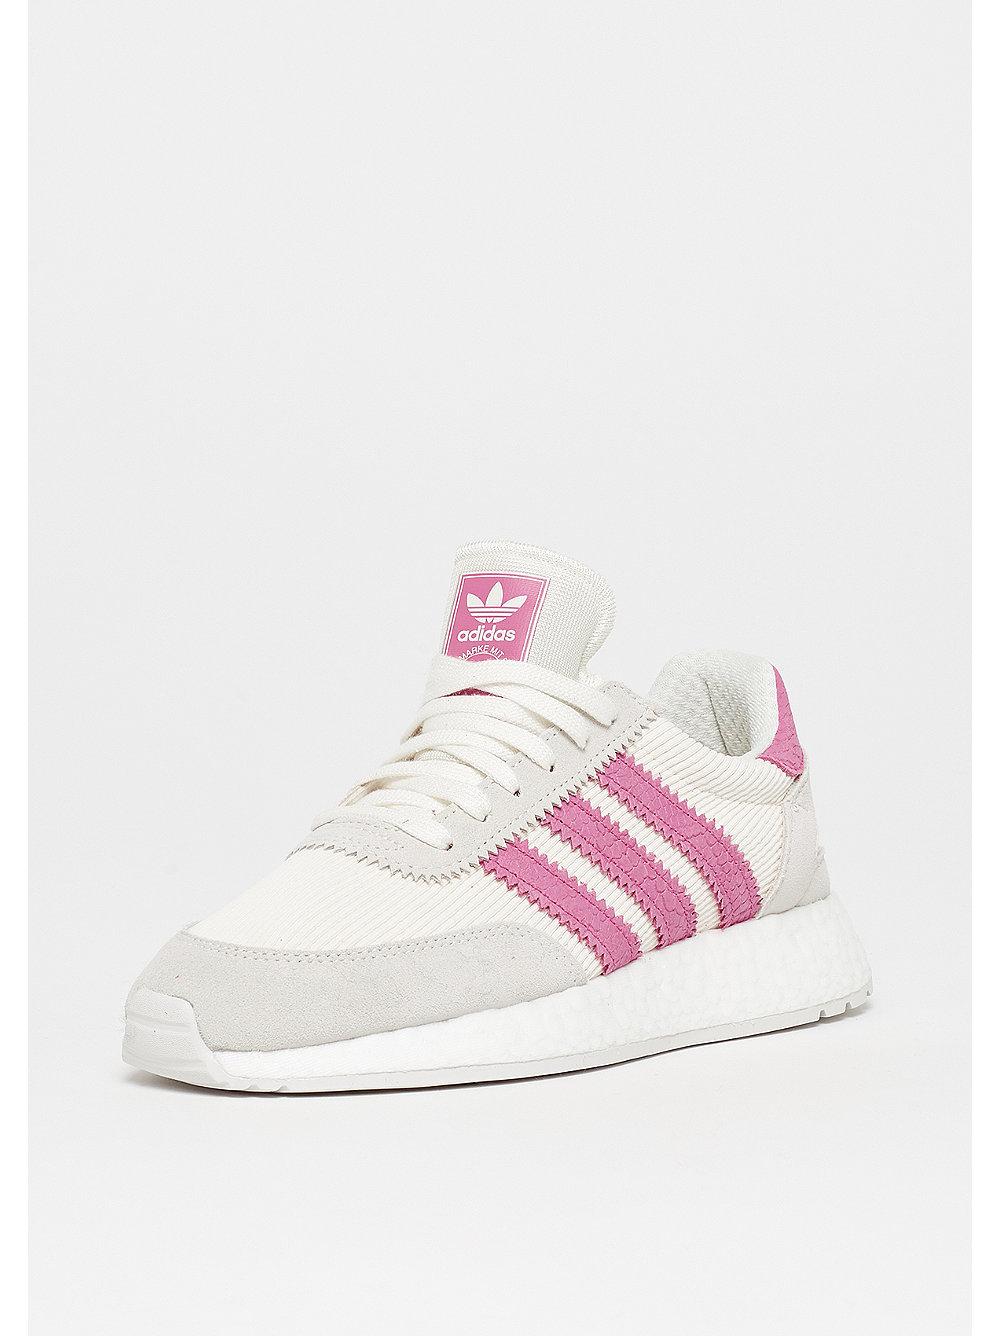 quality design c23ae b1f55 adidas I-5923 W sneakers off white bij SNIPES bestellen!